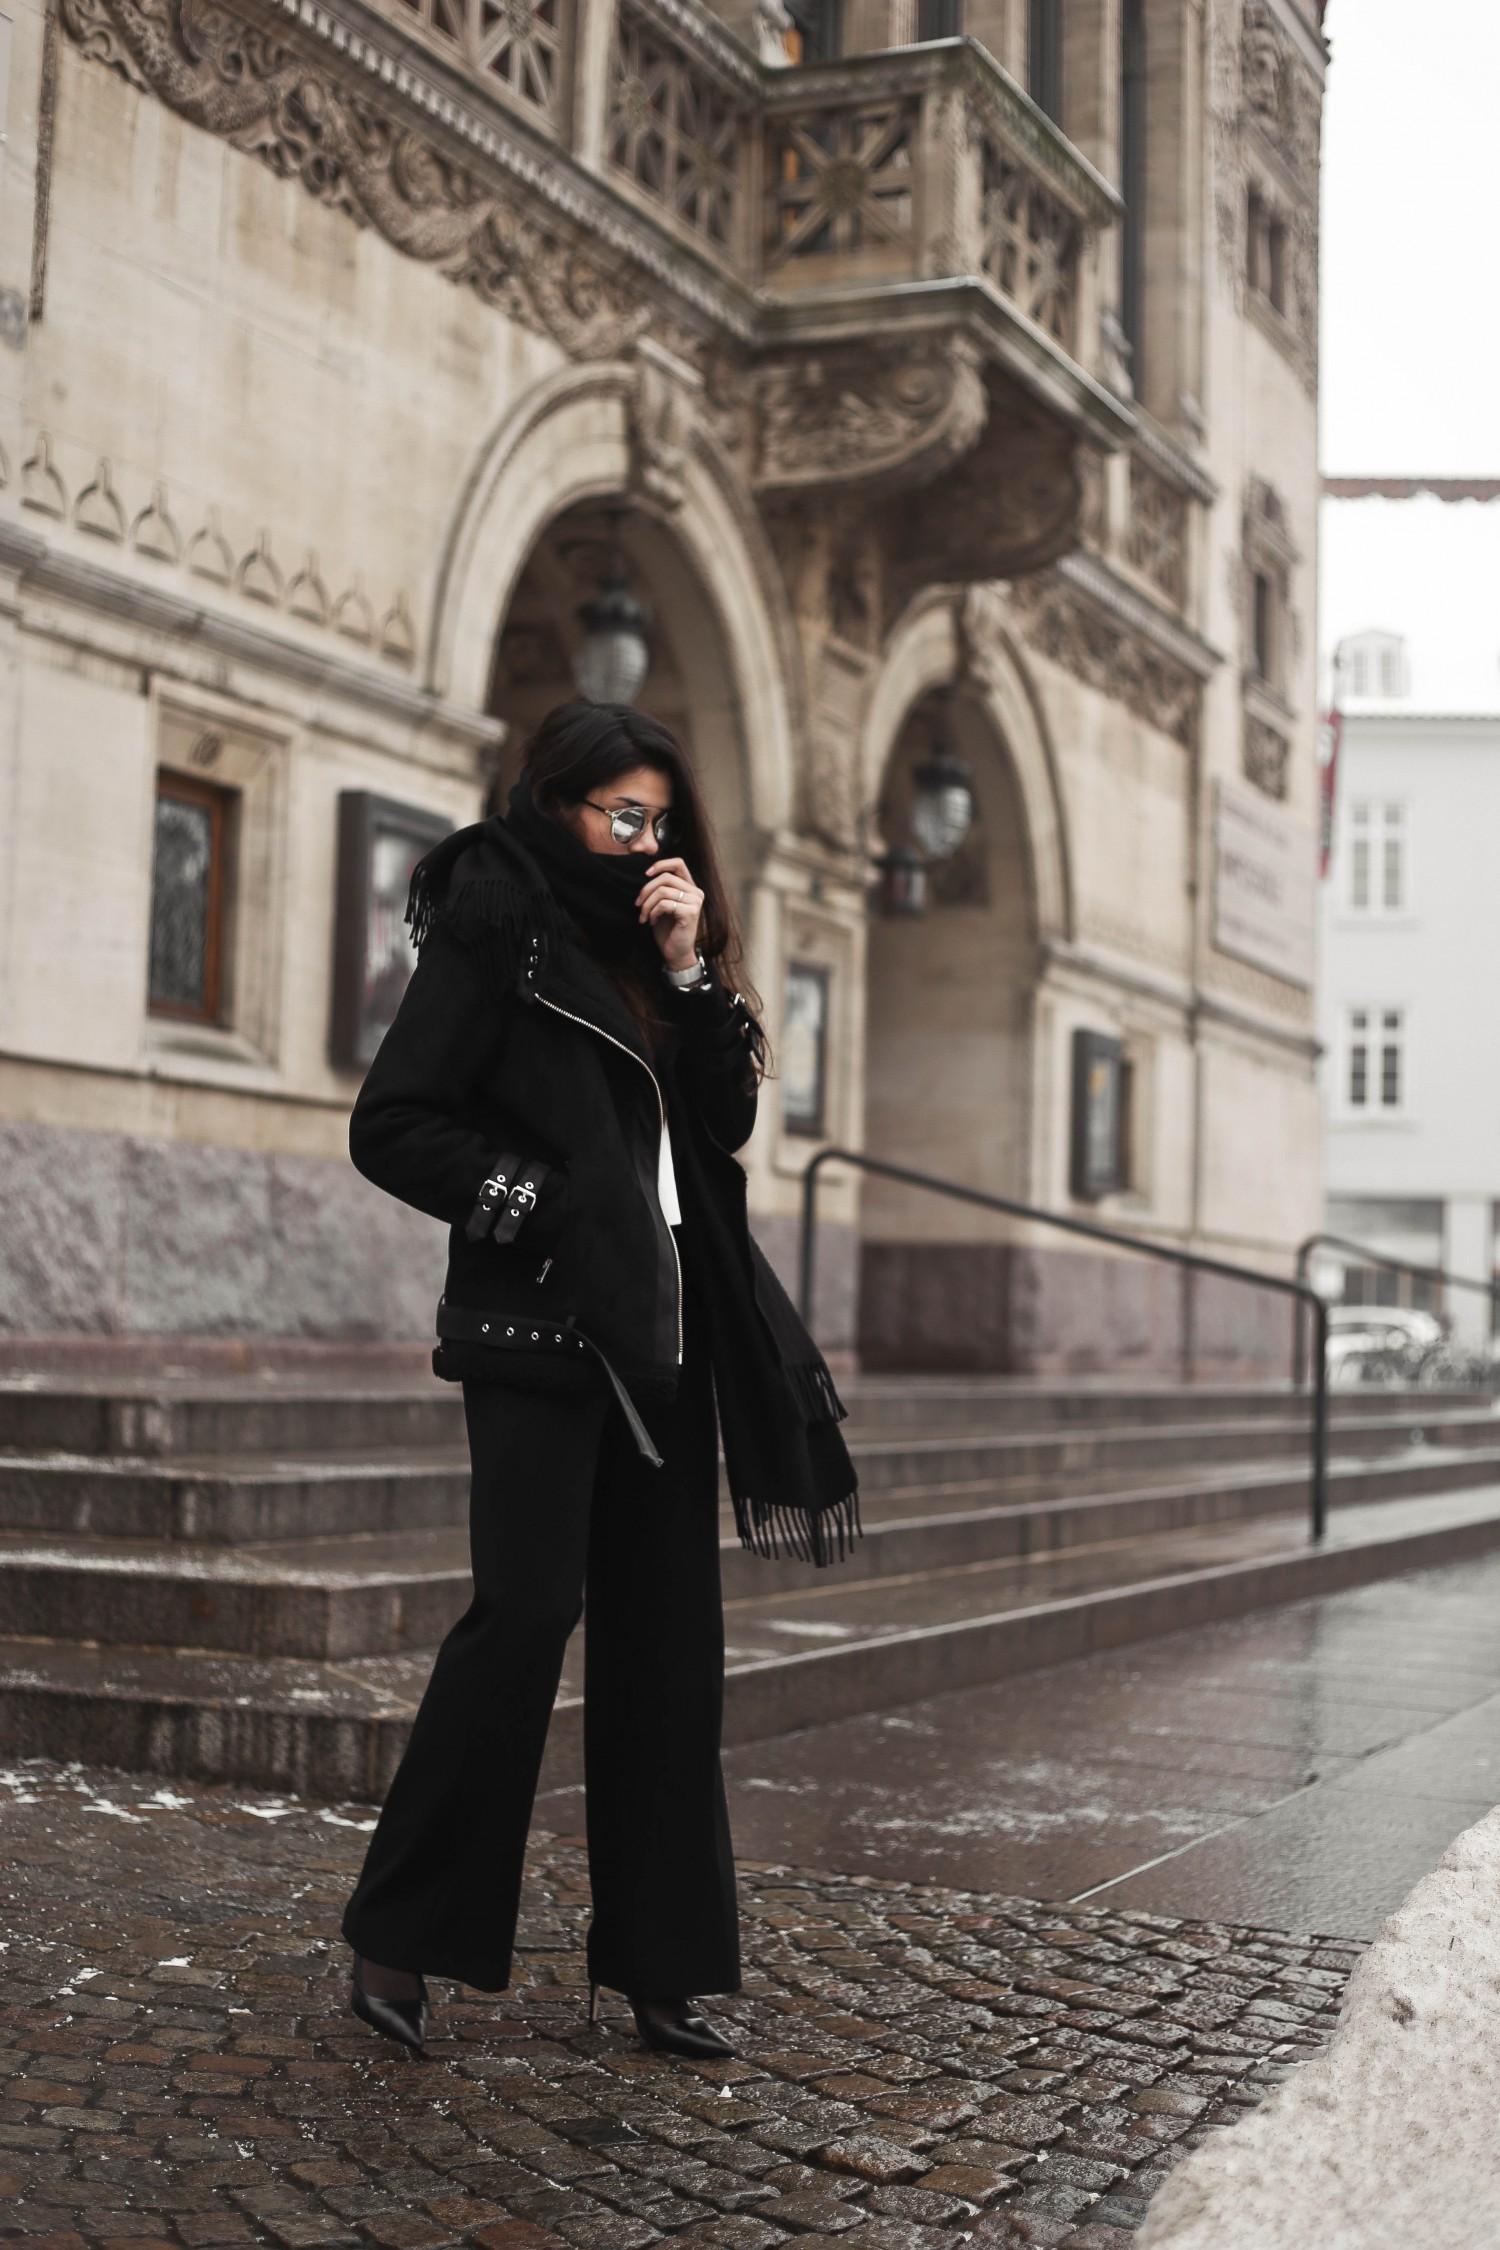 shearling coat-27, shearling coat, gina tricot, hoss pants, pumps, zara pumps, pointy heels, shearling coat outfit, shearling coat style, all black outfit, tailored pants, wide pants outfit, mowoblog, mowo blog, celine trio bag outfit, black on black outfit, winter outfit, danish fashion blogger, fashion blogger, blogger, blogger europe, blog, fashion blog, style blog, danish, scandinavian style